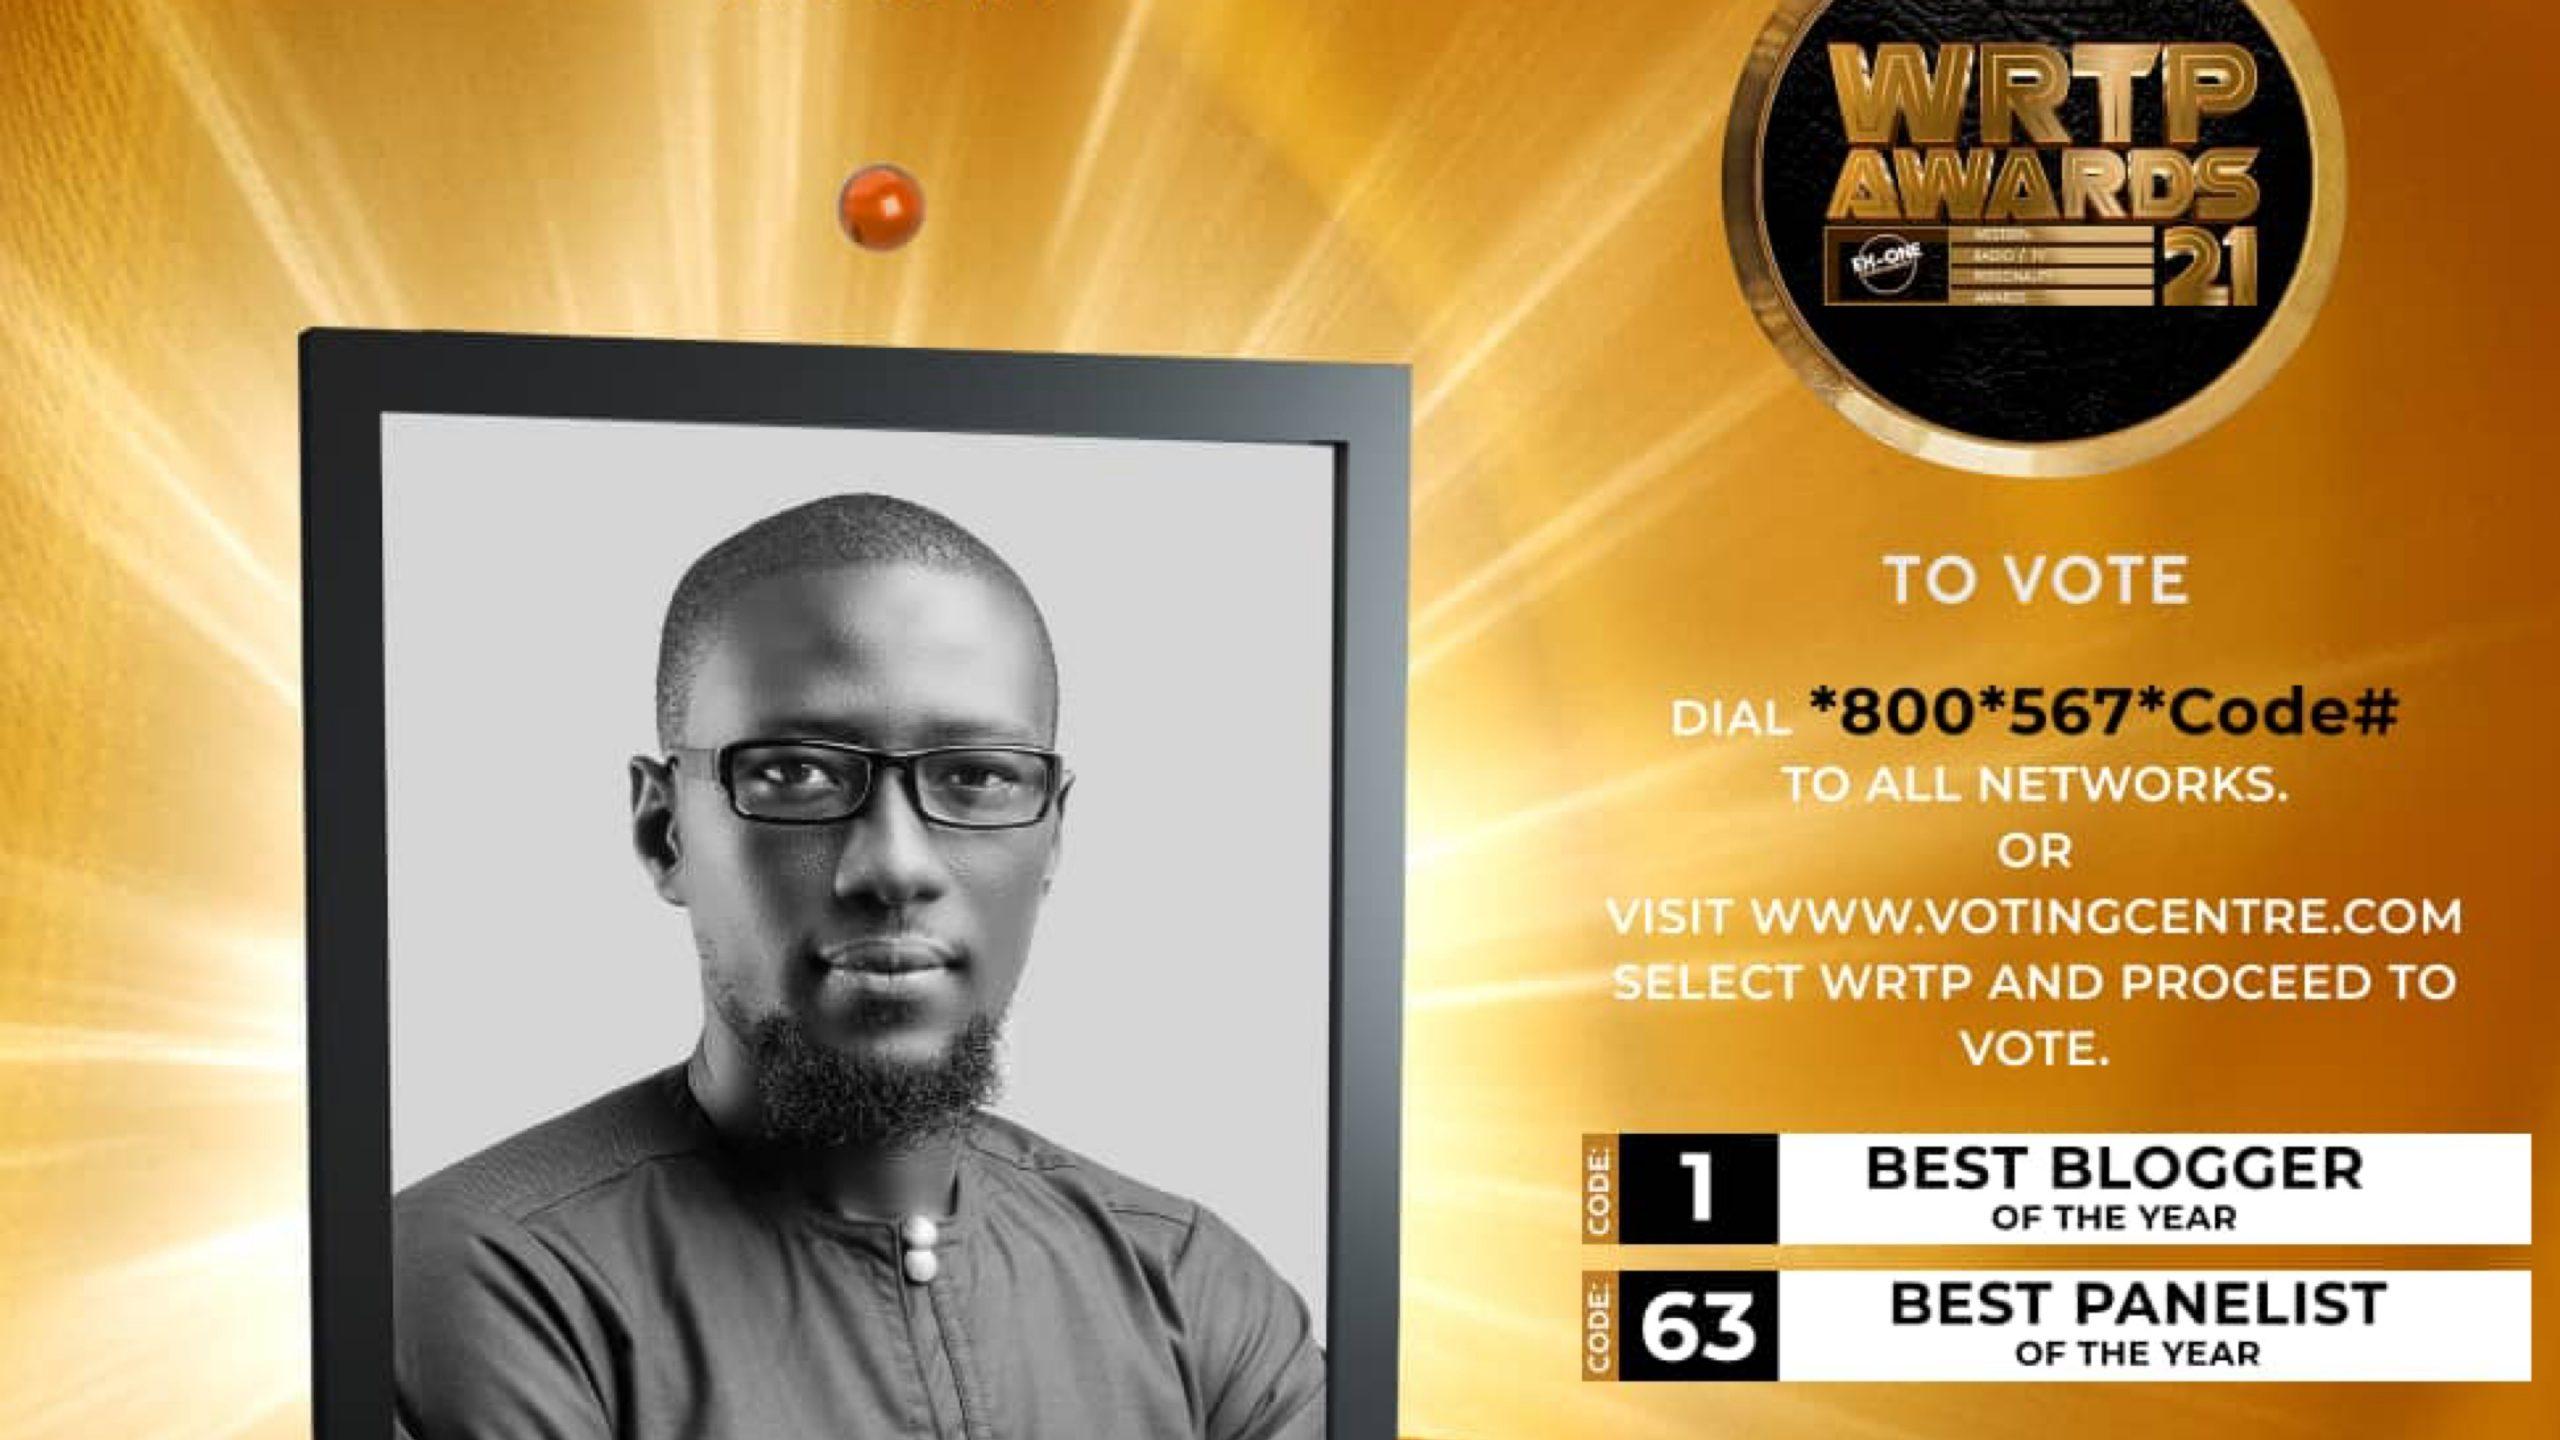 Boga Ali Hashim bags two nominations at WRTP Awards 2021